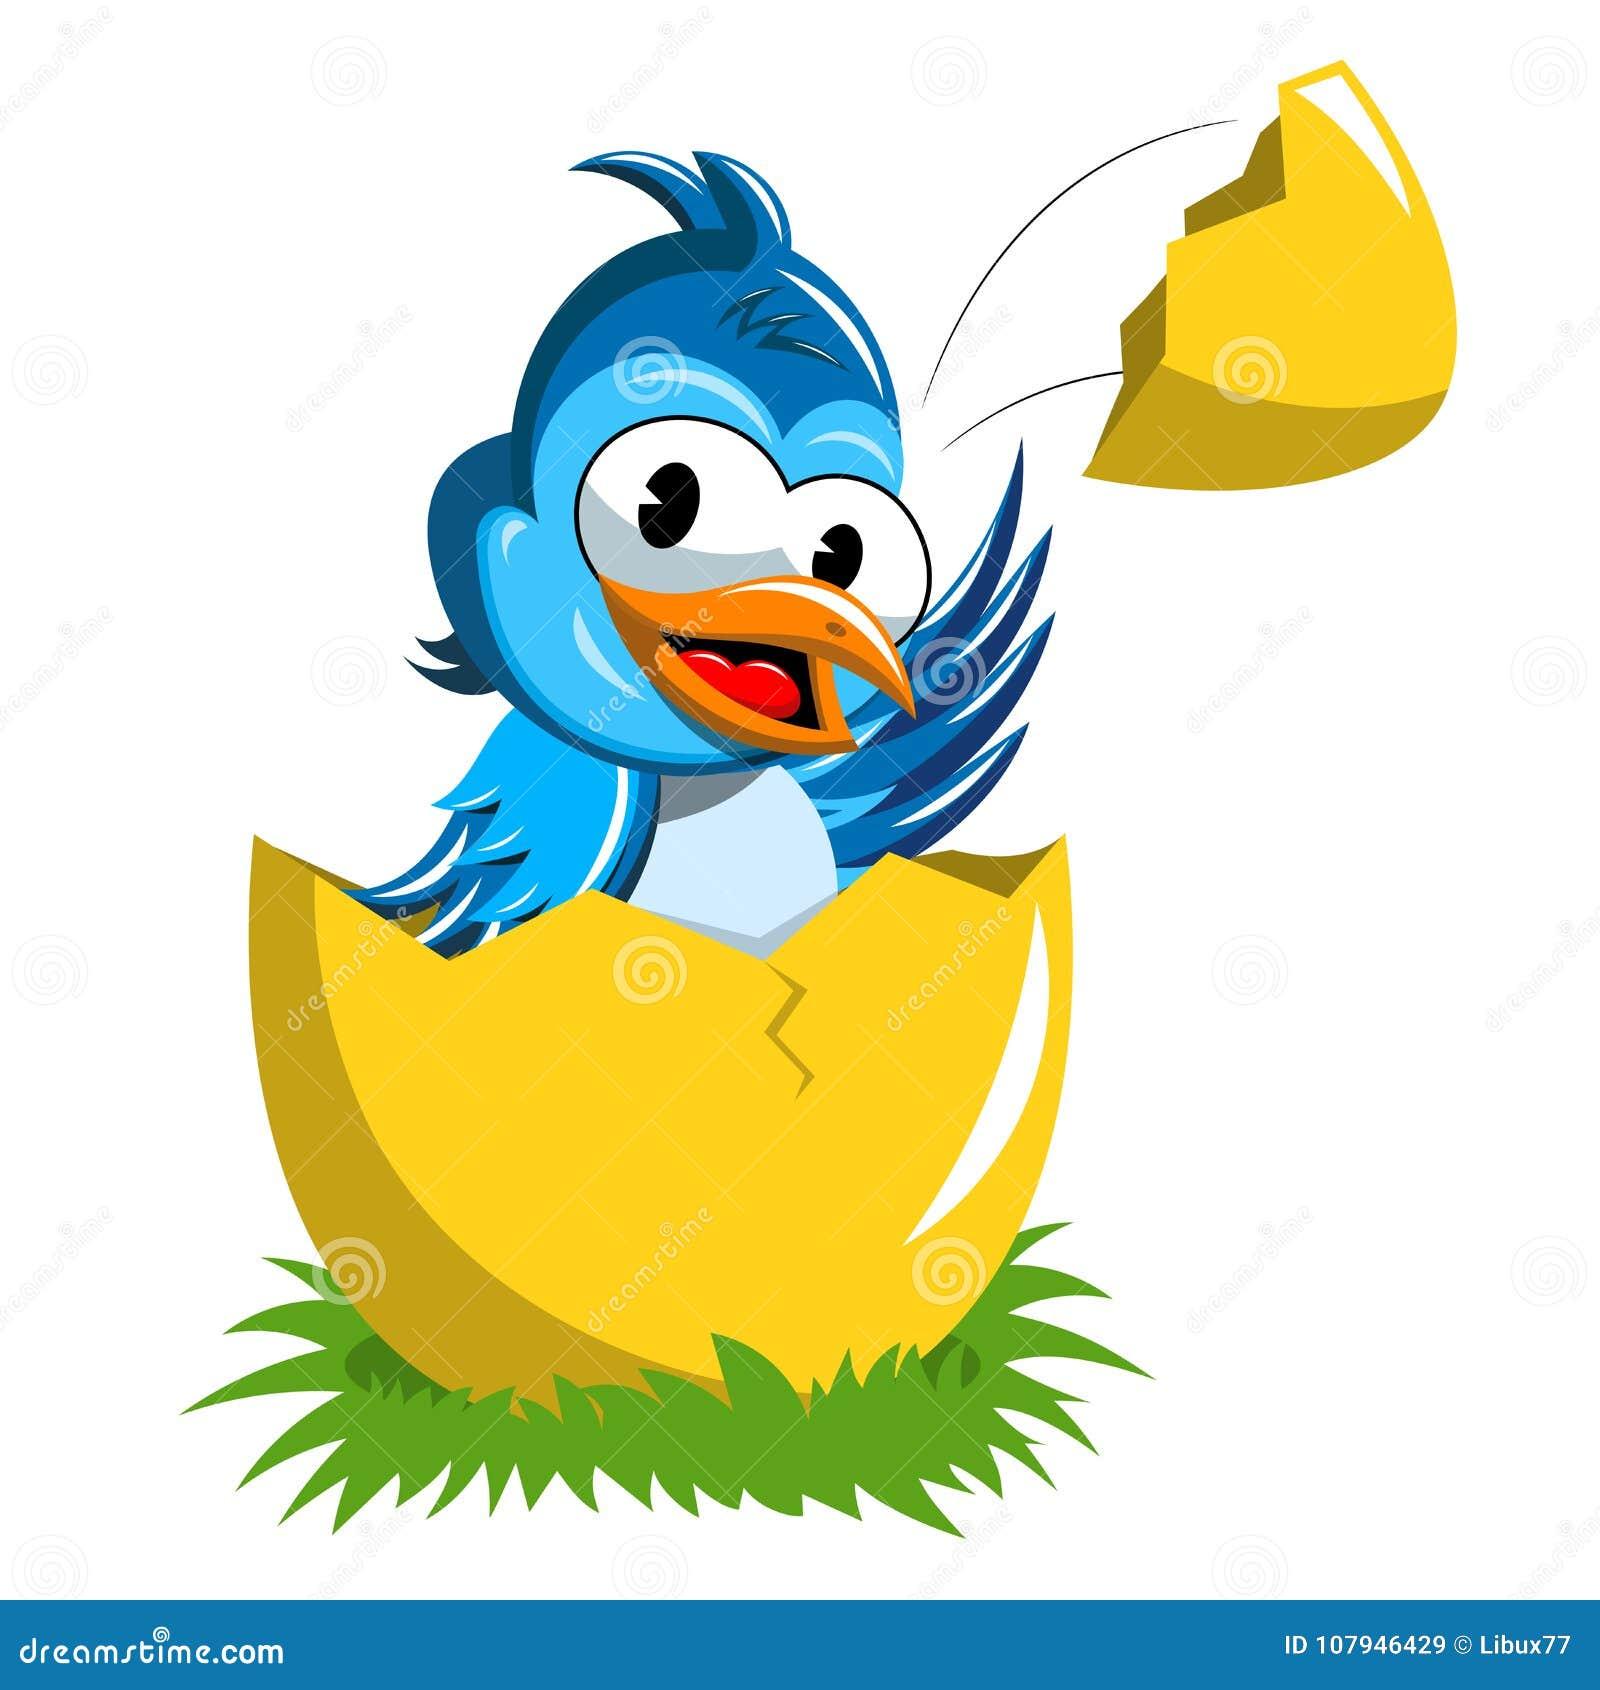 Cute bird popping up broken egg isolated